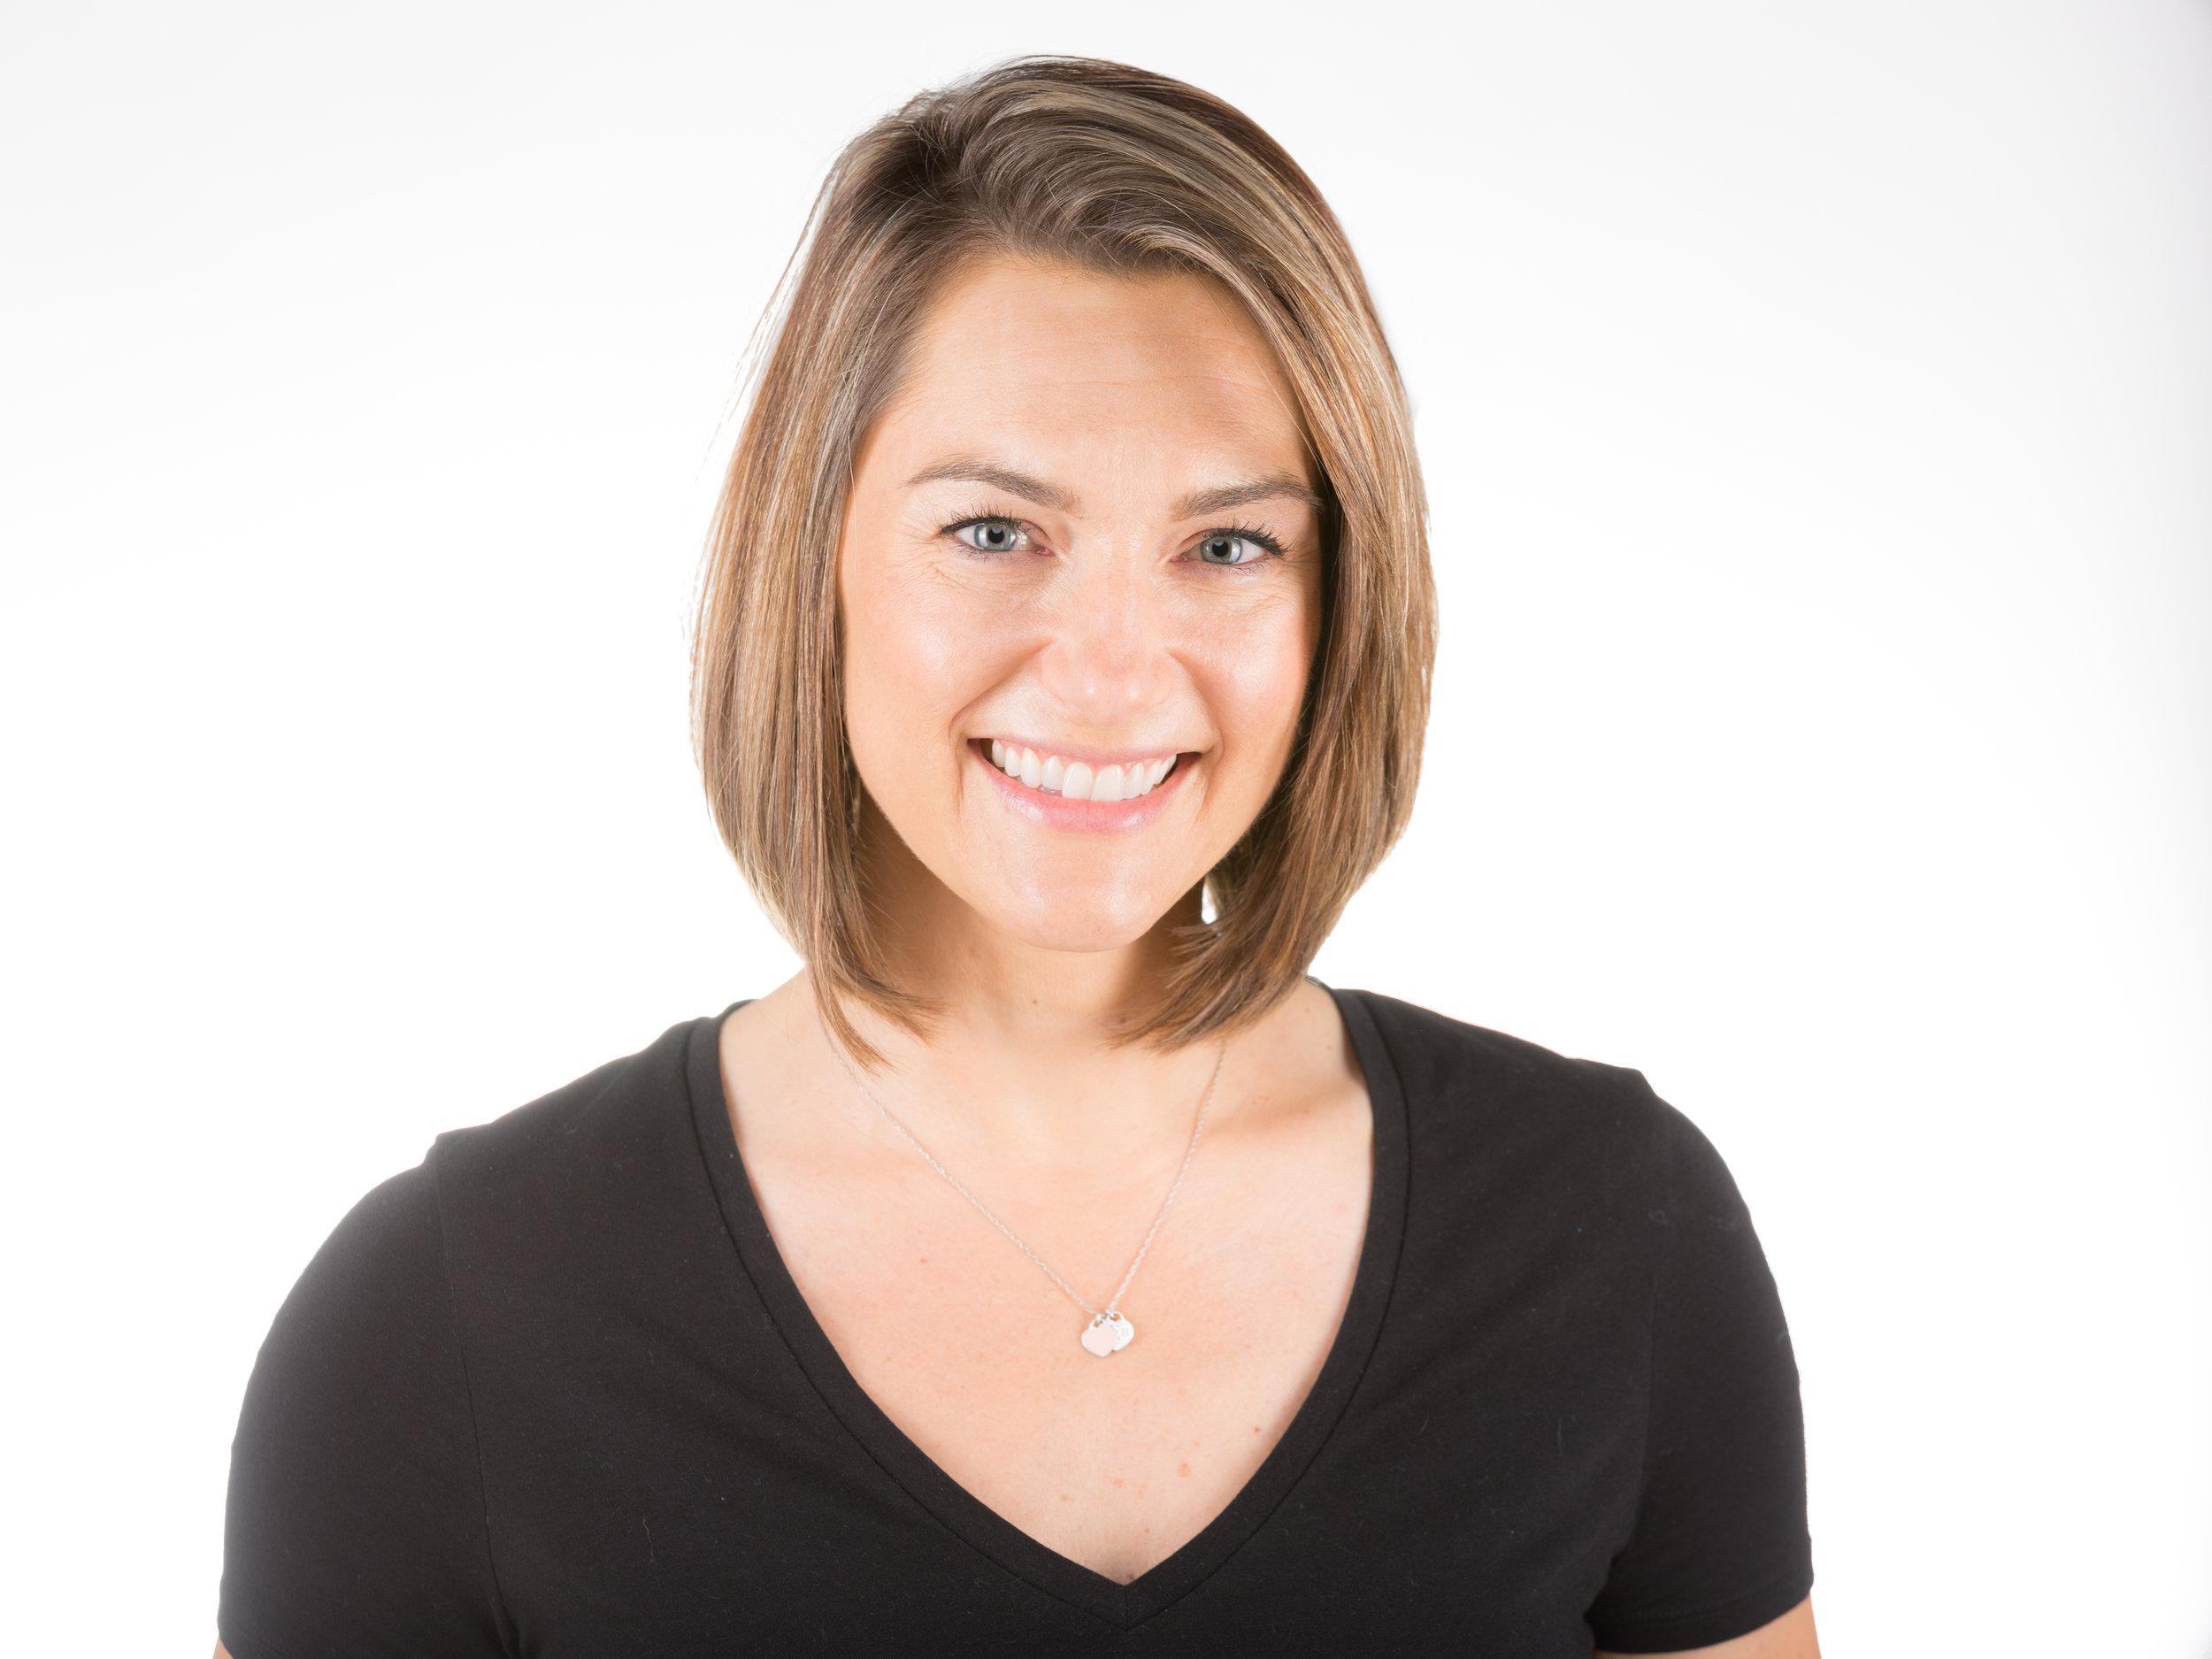 Jada | Lead School Psychologist